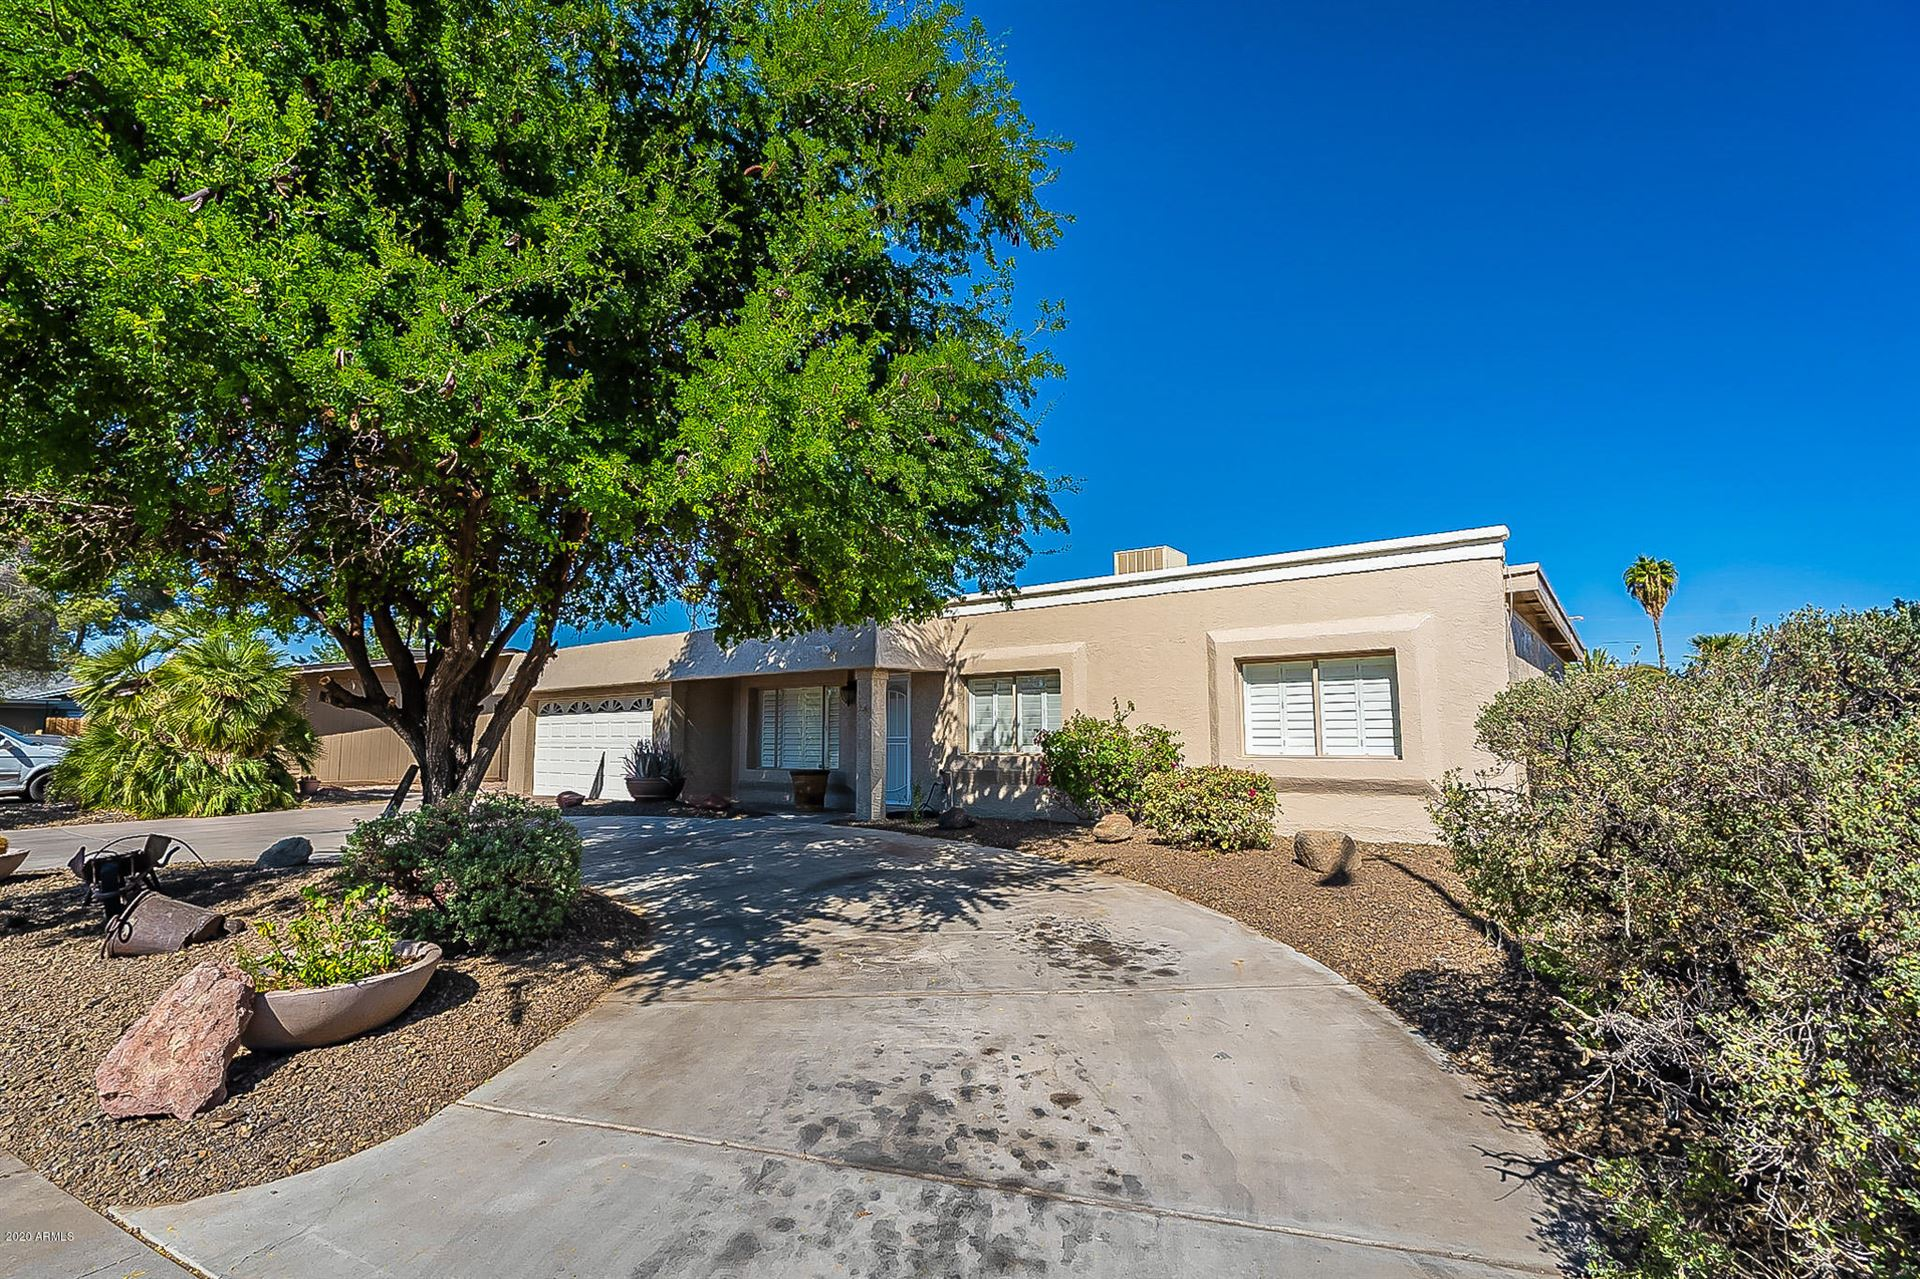 Photo for 3034 E DAHLIA Drive, Phoenix, AZ 85032 (MLS # 6151433)